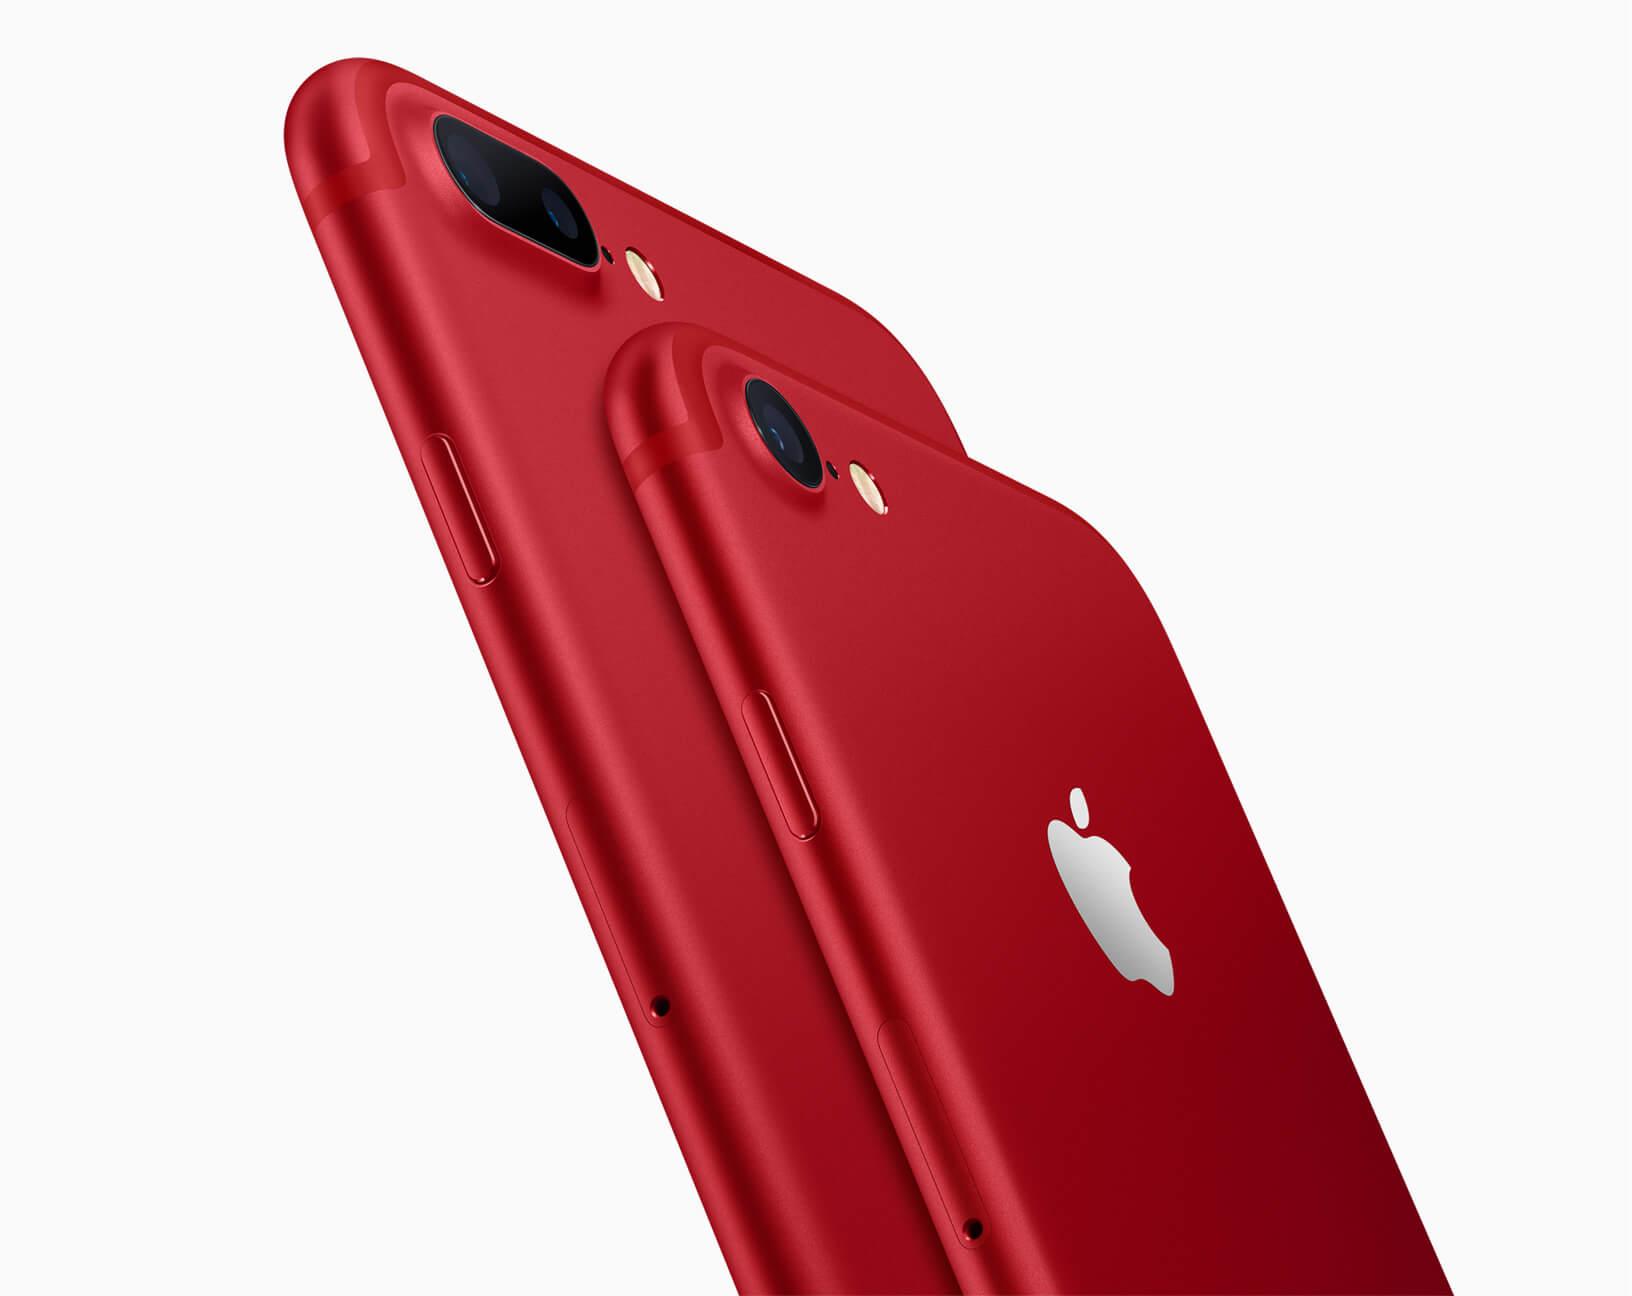 iphone 7 și iphone 7 plus red main glassgsm service gsm suceava